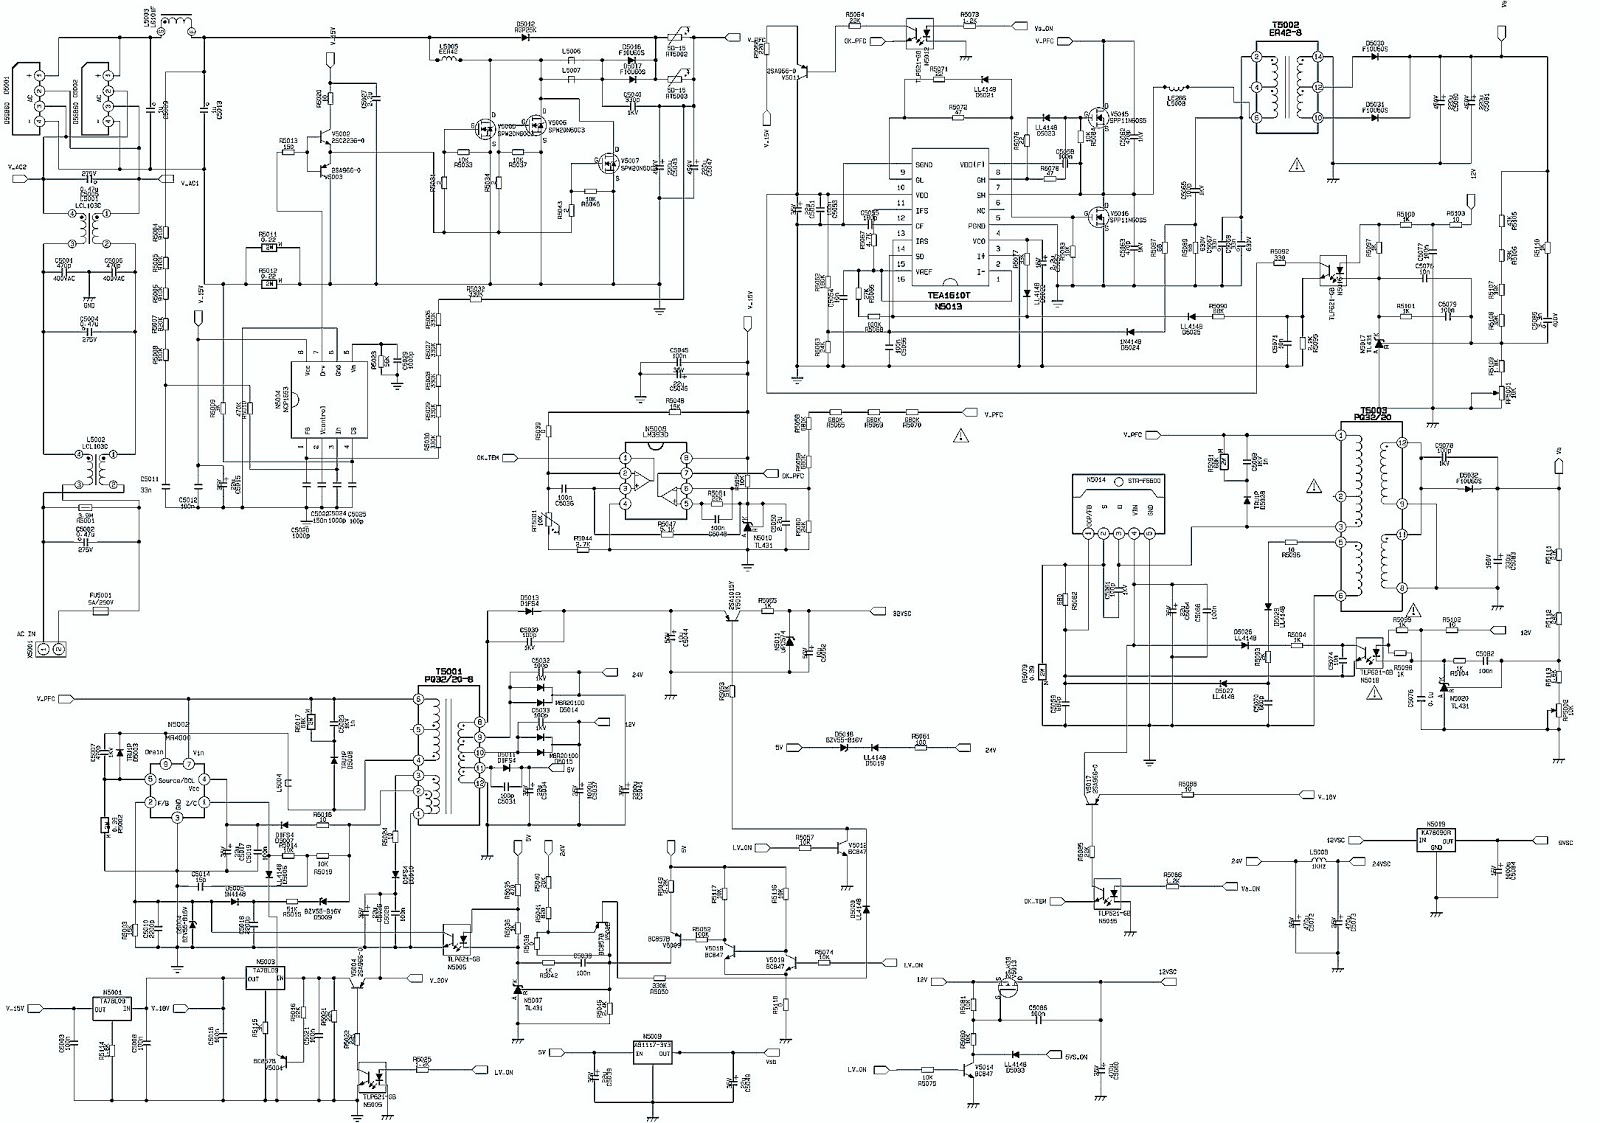 Schematic Diagrams: Samsung PPM42H3 and Xoceco 6HA0182010